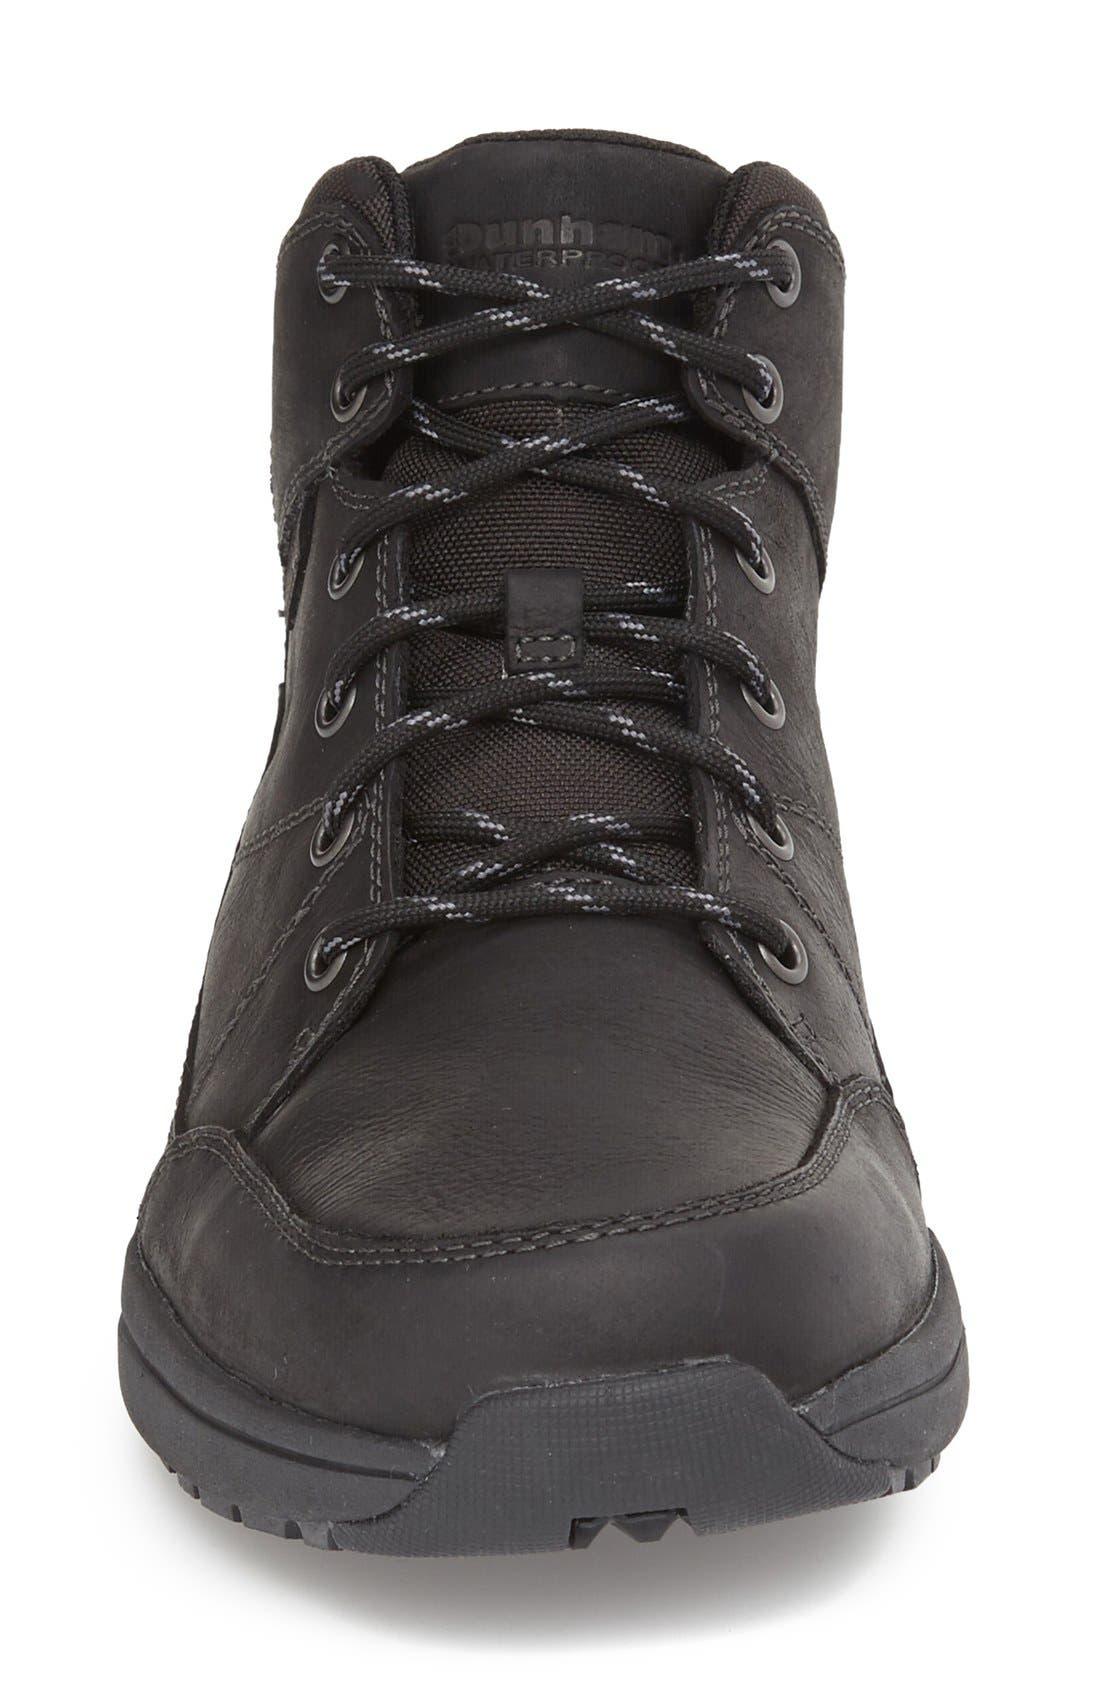 Simon-Dun Waterproof Boot,                             Alternate thumbnail 3, color,                             BLACK LEATHER